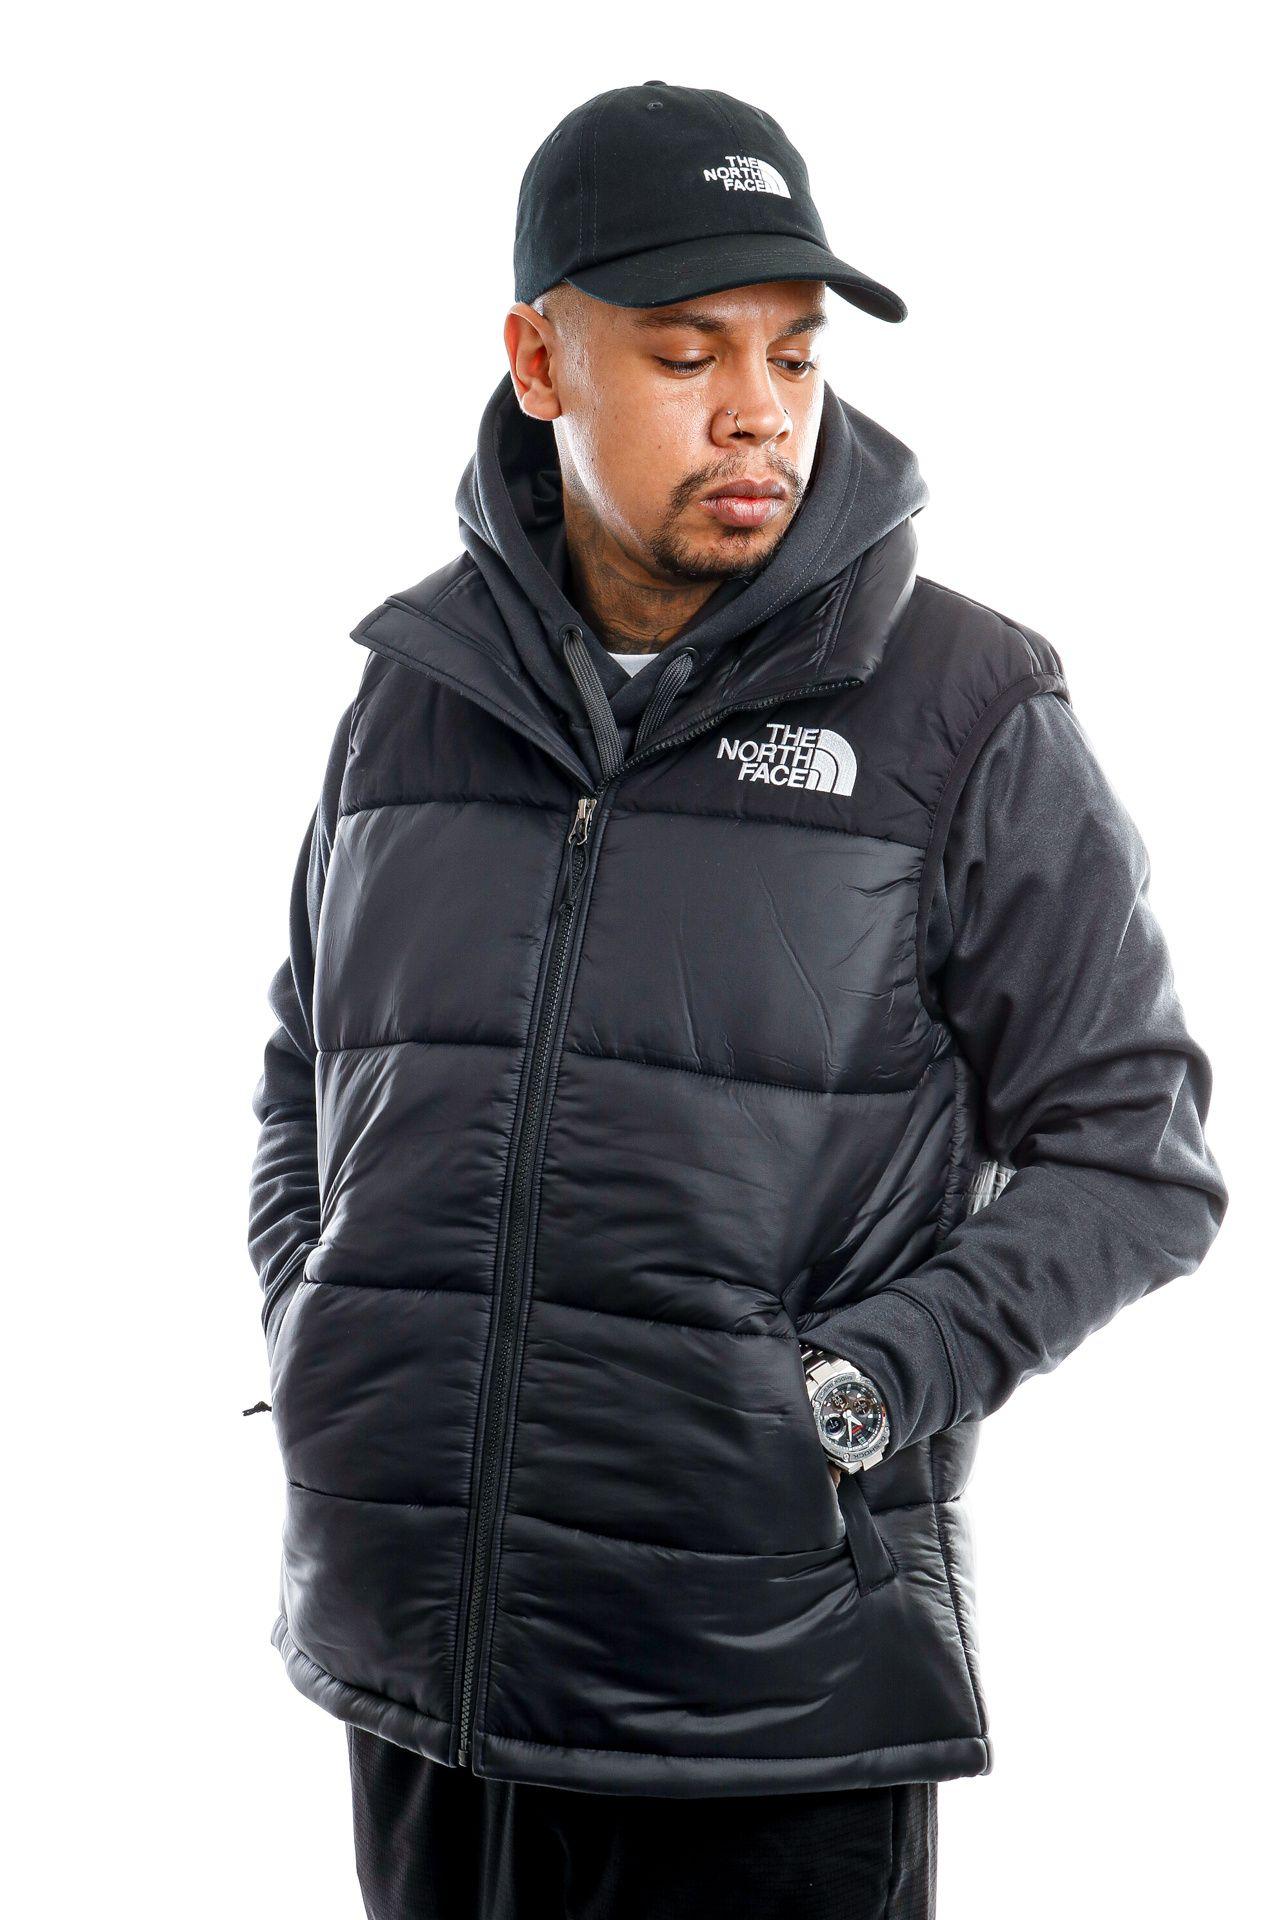 Afbeelding van The North Face Vest Men's Hmlyn Insulated Vest Black NF0A4QZ4JK31